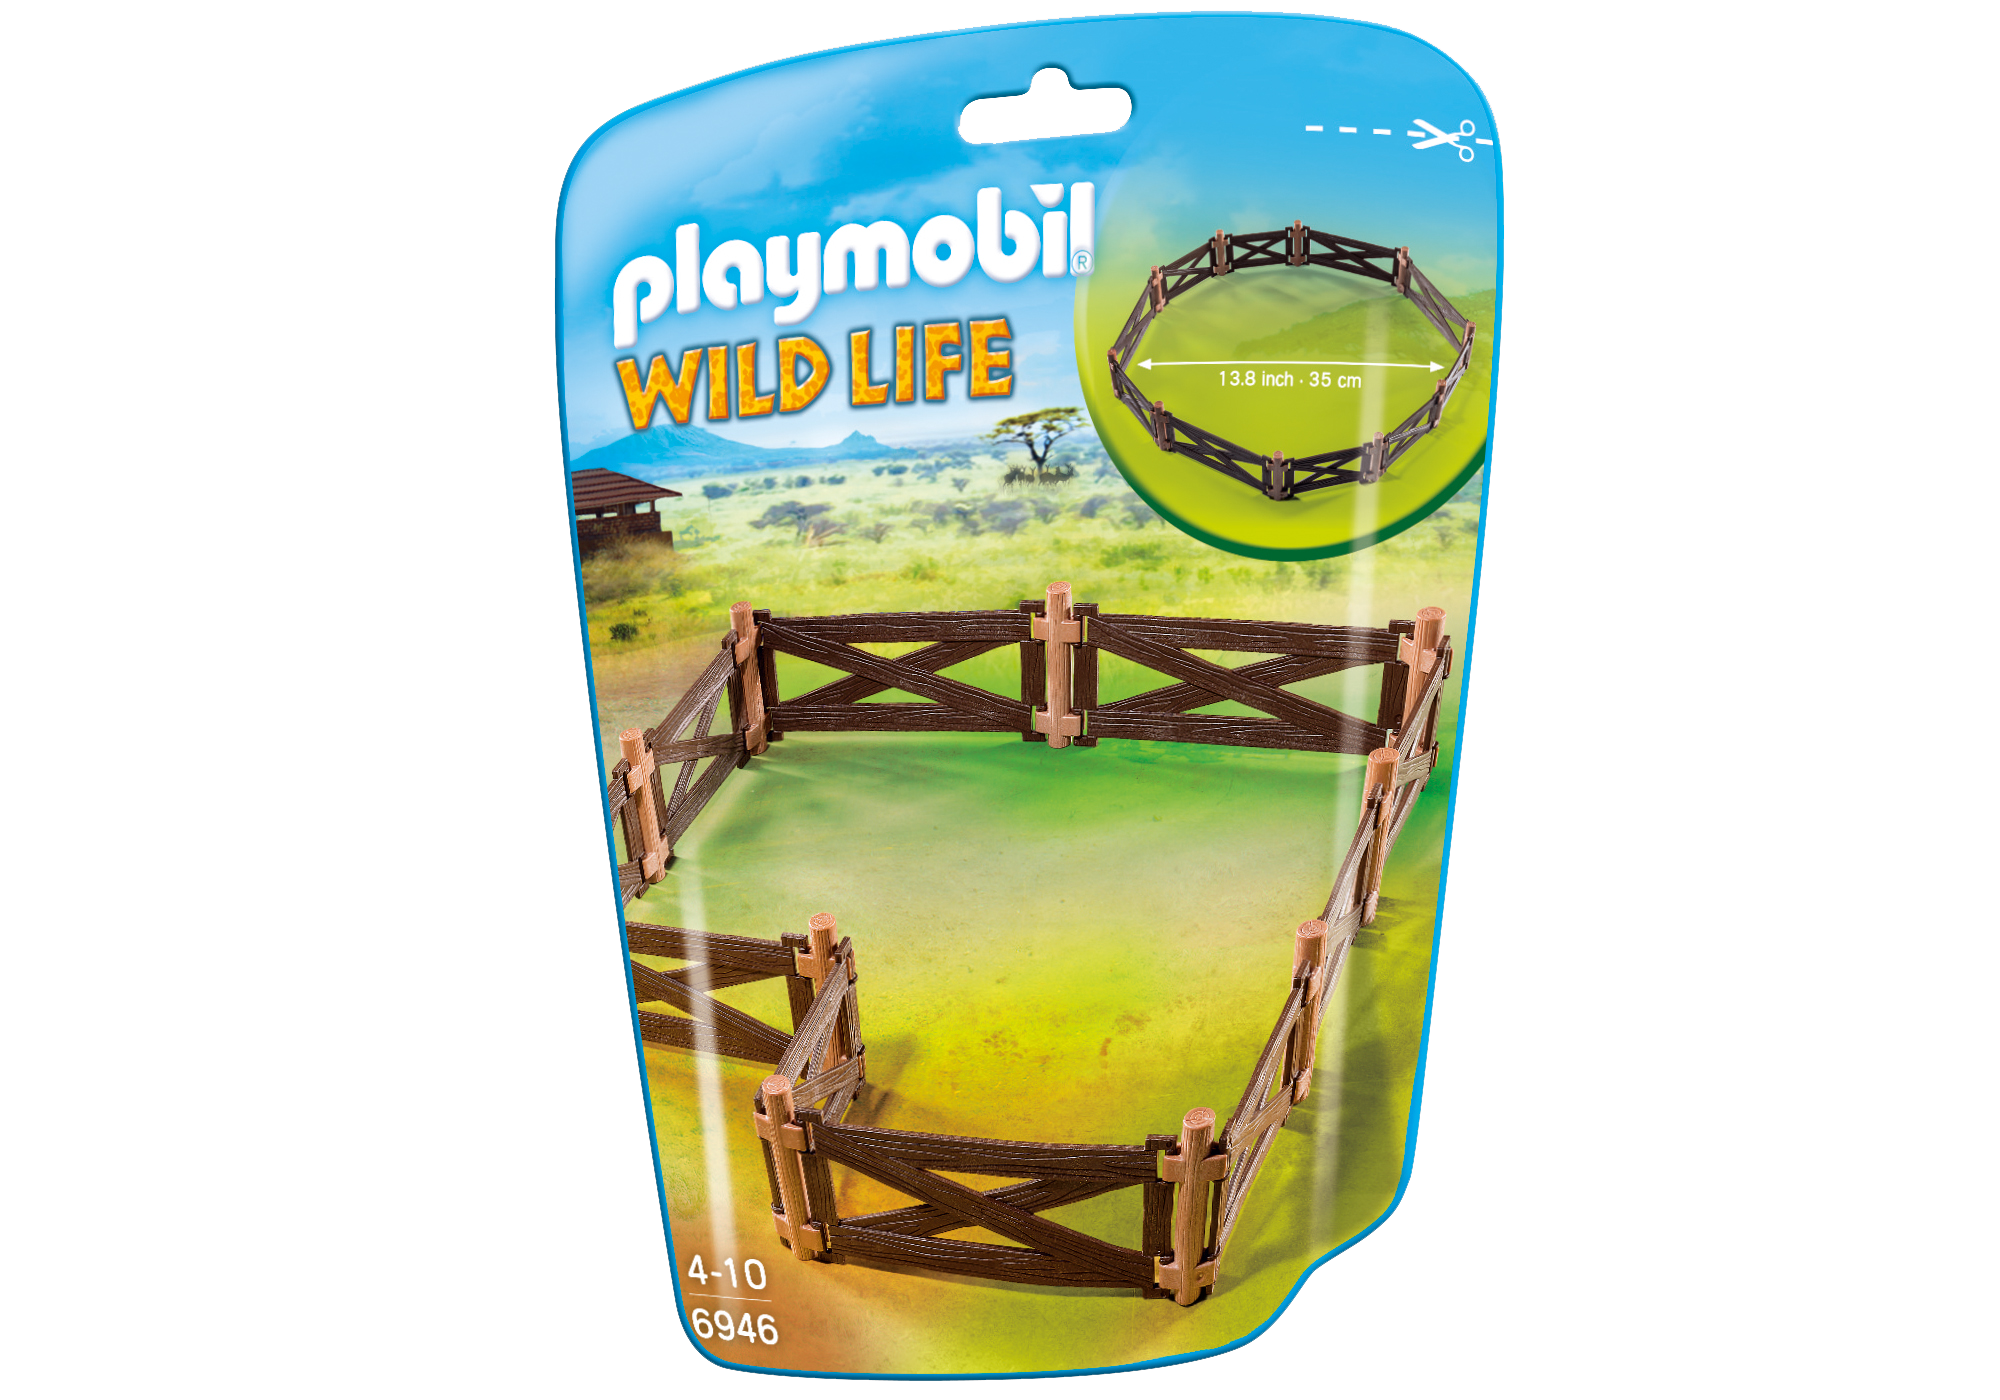 http://media.playmobil.com/i/playmobil/6946_product_box_front